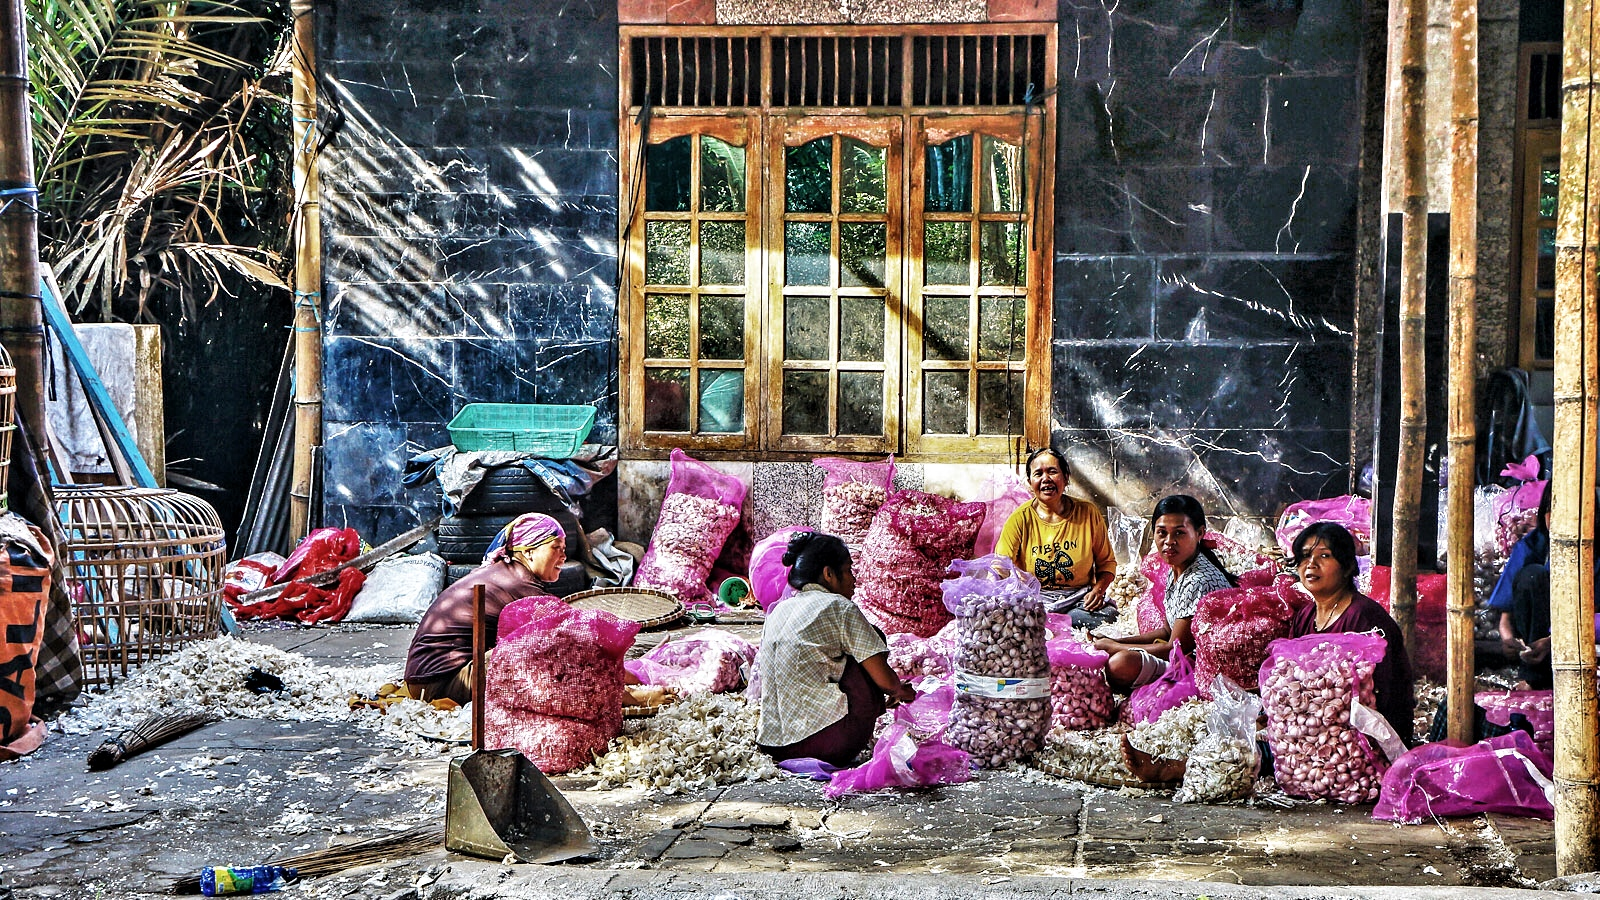 Indonesien Erlebnisreise in der Gruppe traveljunkies